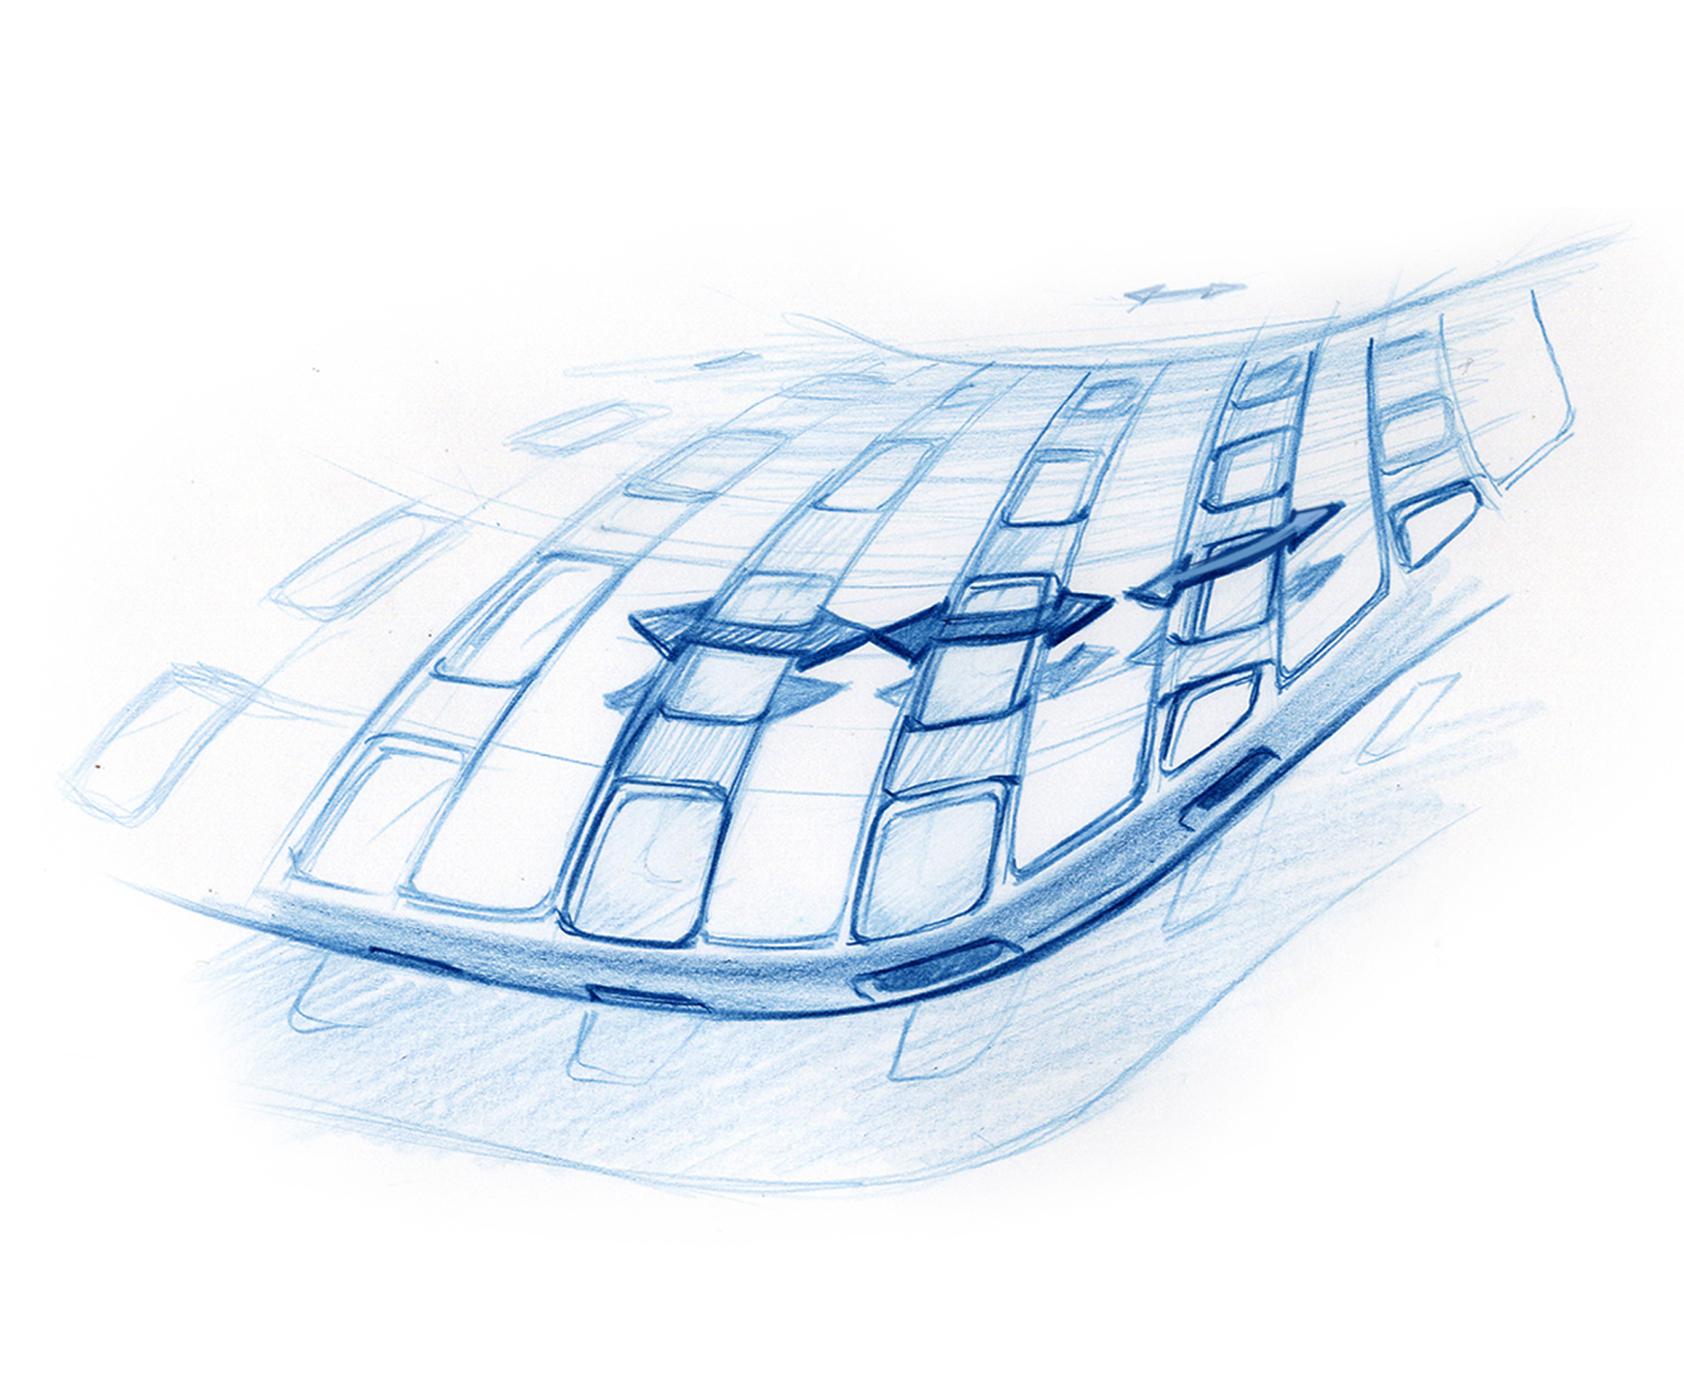 02H_DarioNarvaez_Portfolio_Ingo_Chair_Concept_Development_WEB-5.jpg